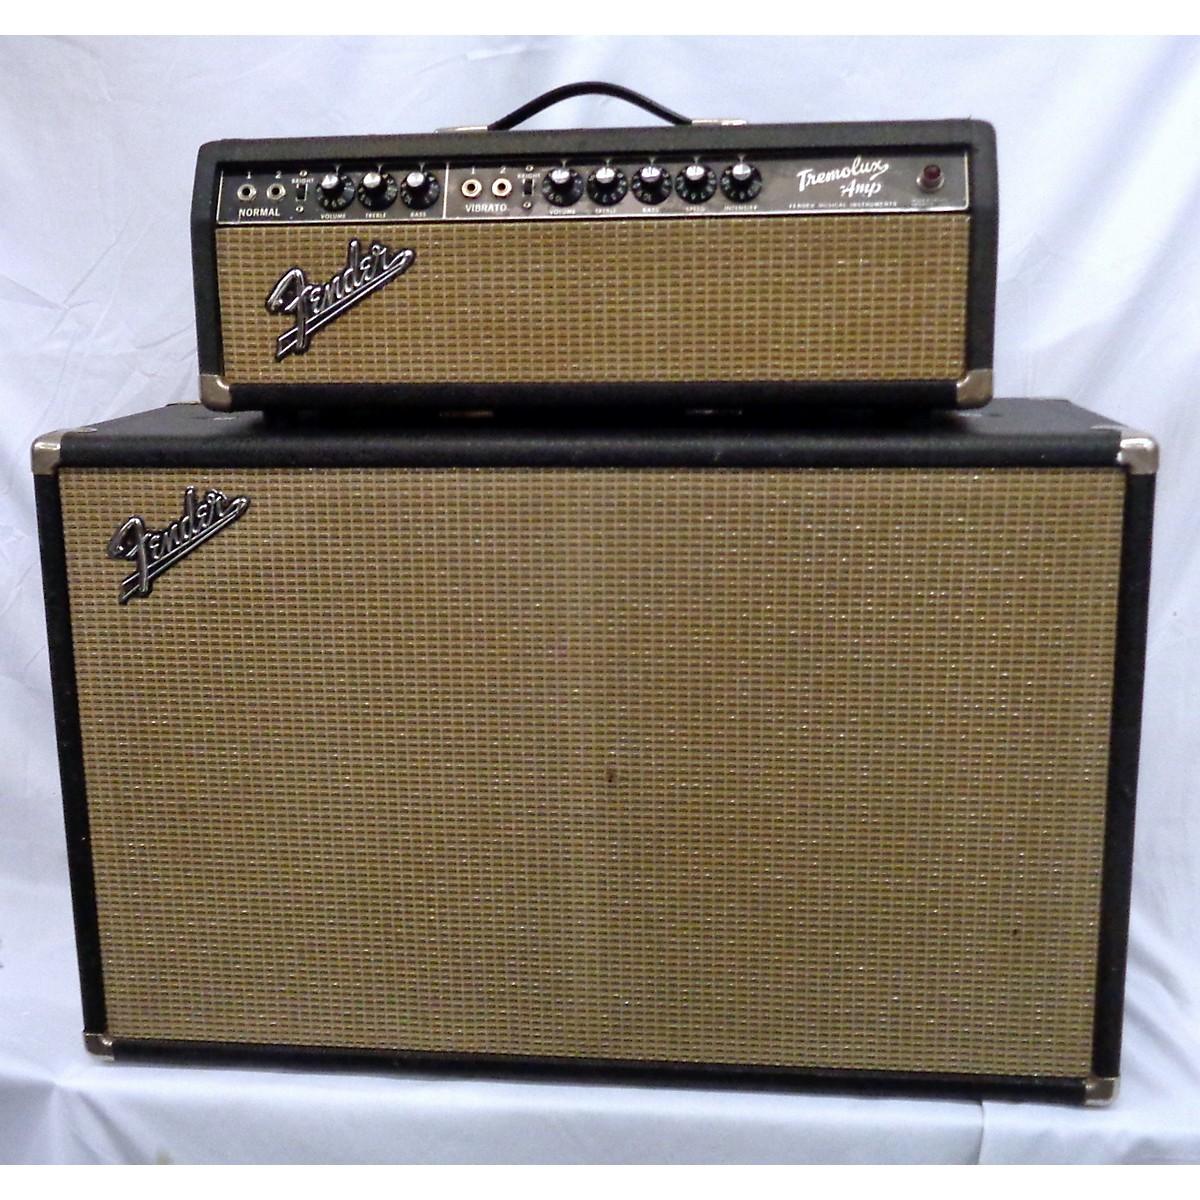 Fender 1966 Tremolux Head And Cab Tube Guitar Amp Head